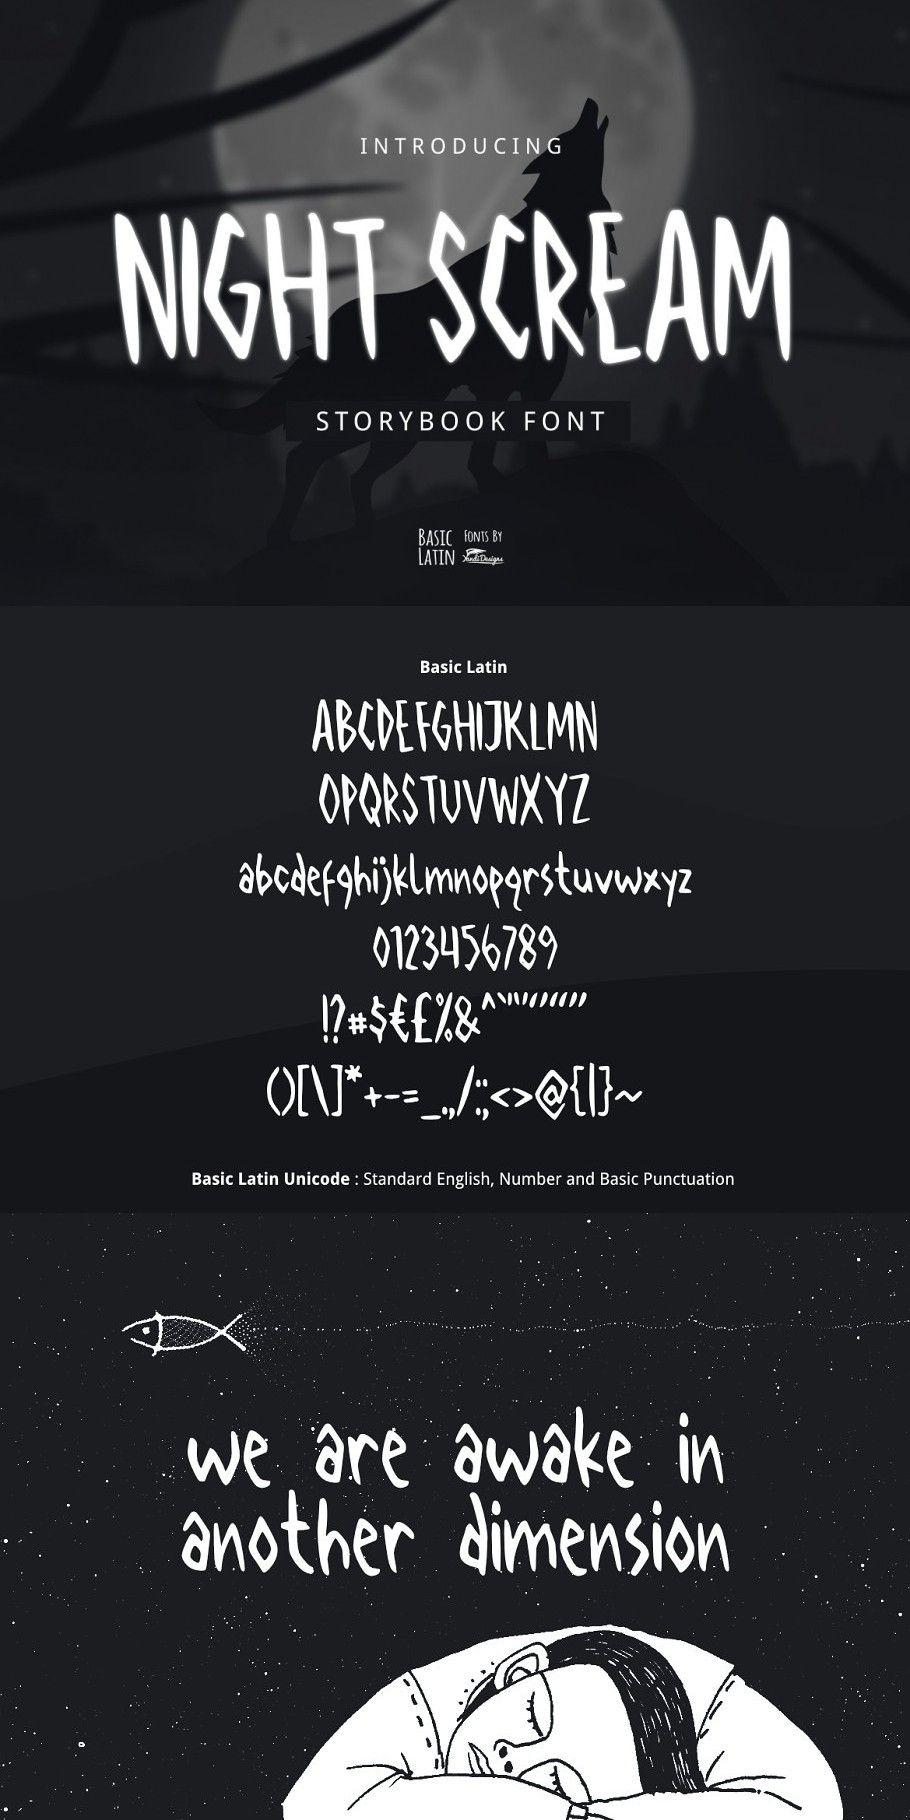 Download Night Scream Font in 2020 | Handmade font, English ...